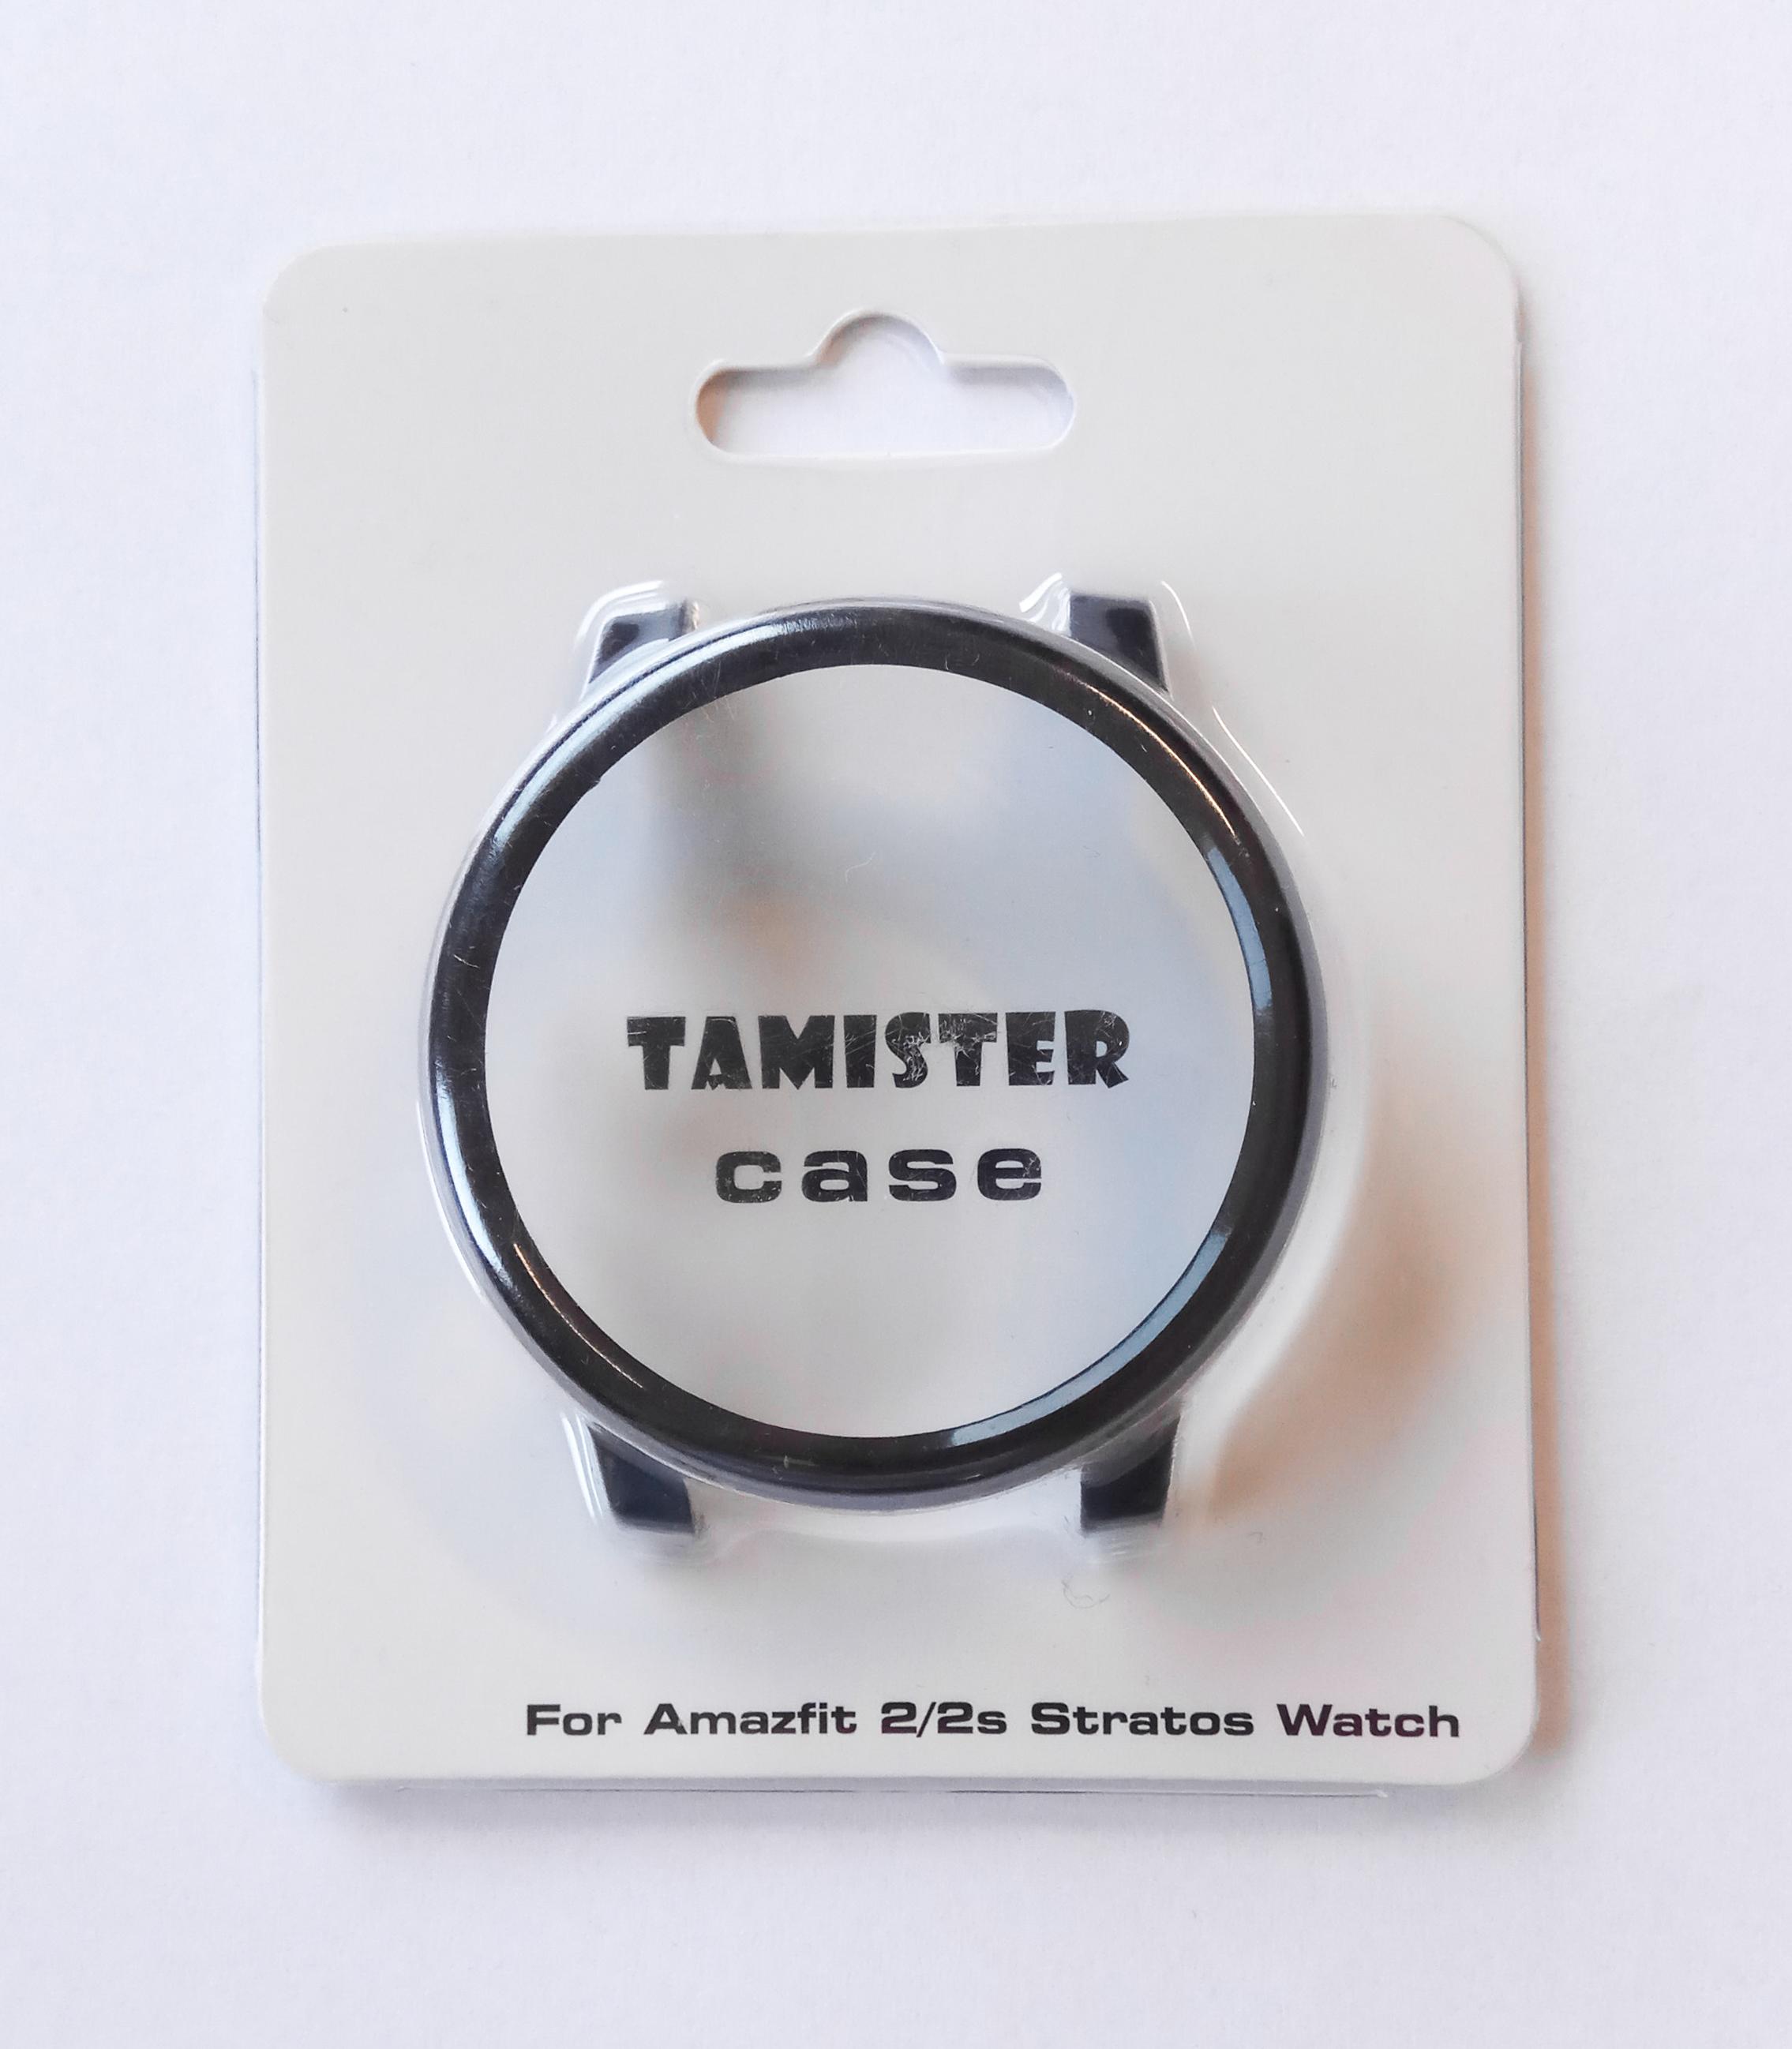 Amazfit Stratos védőtok (Tamister) - fekete